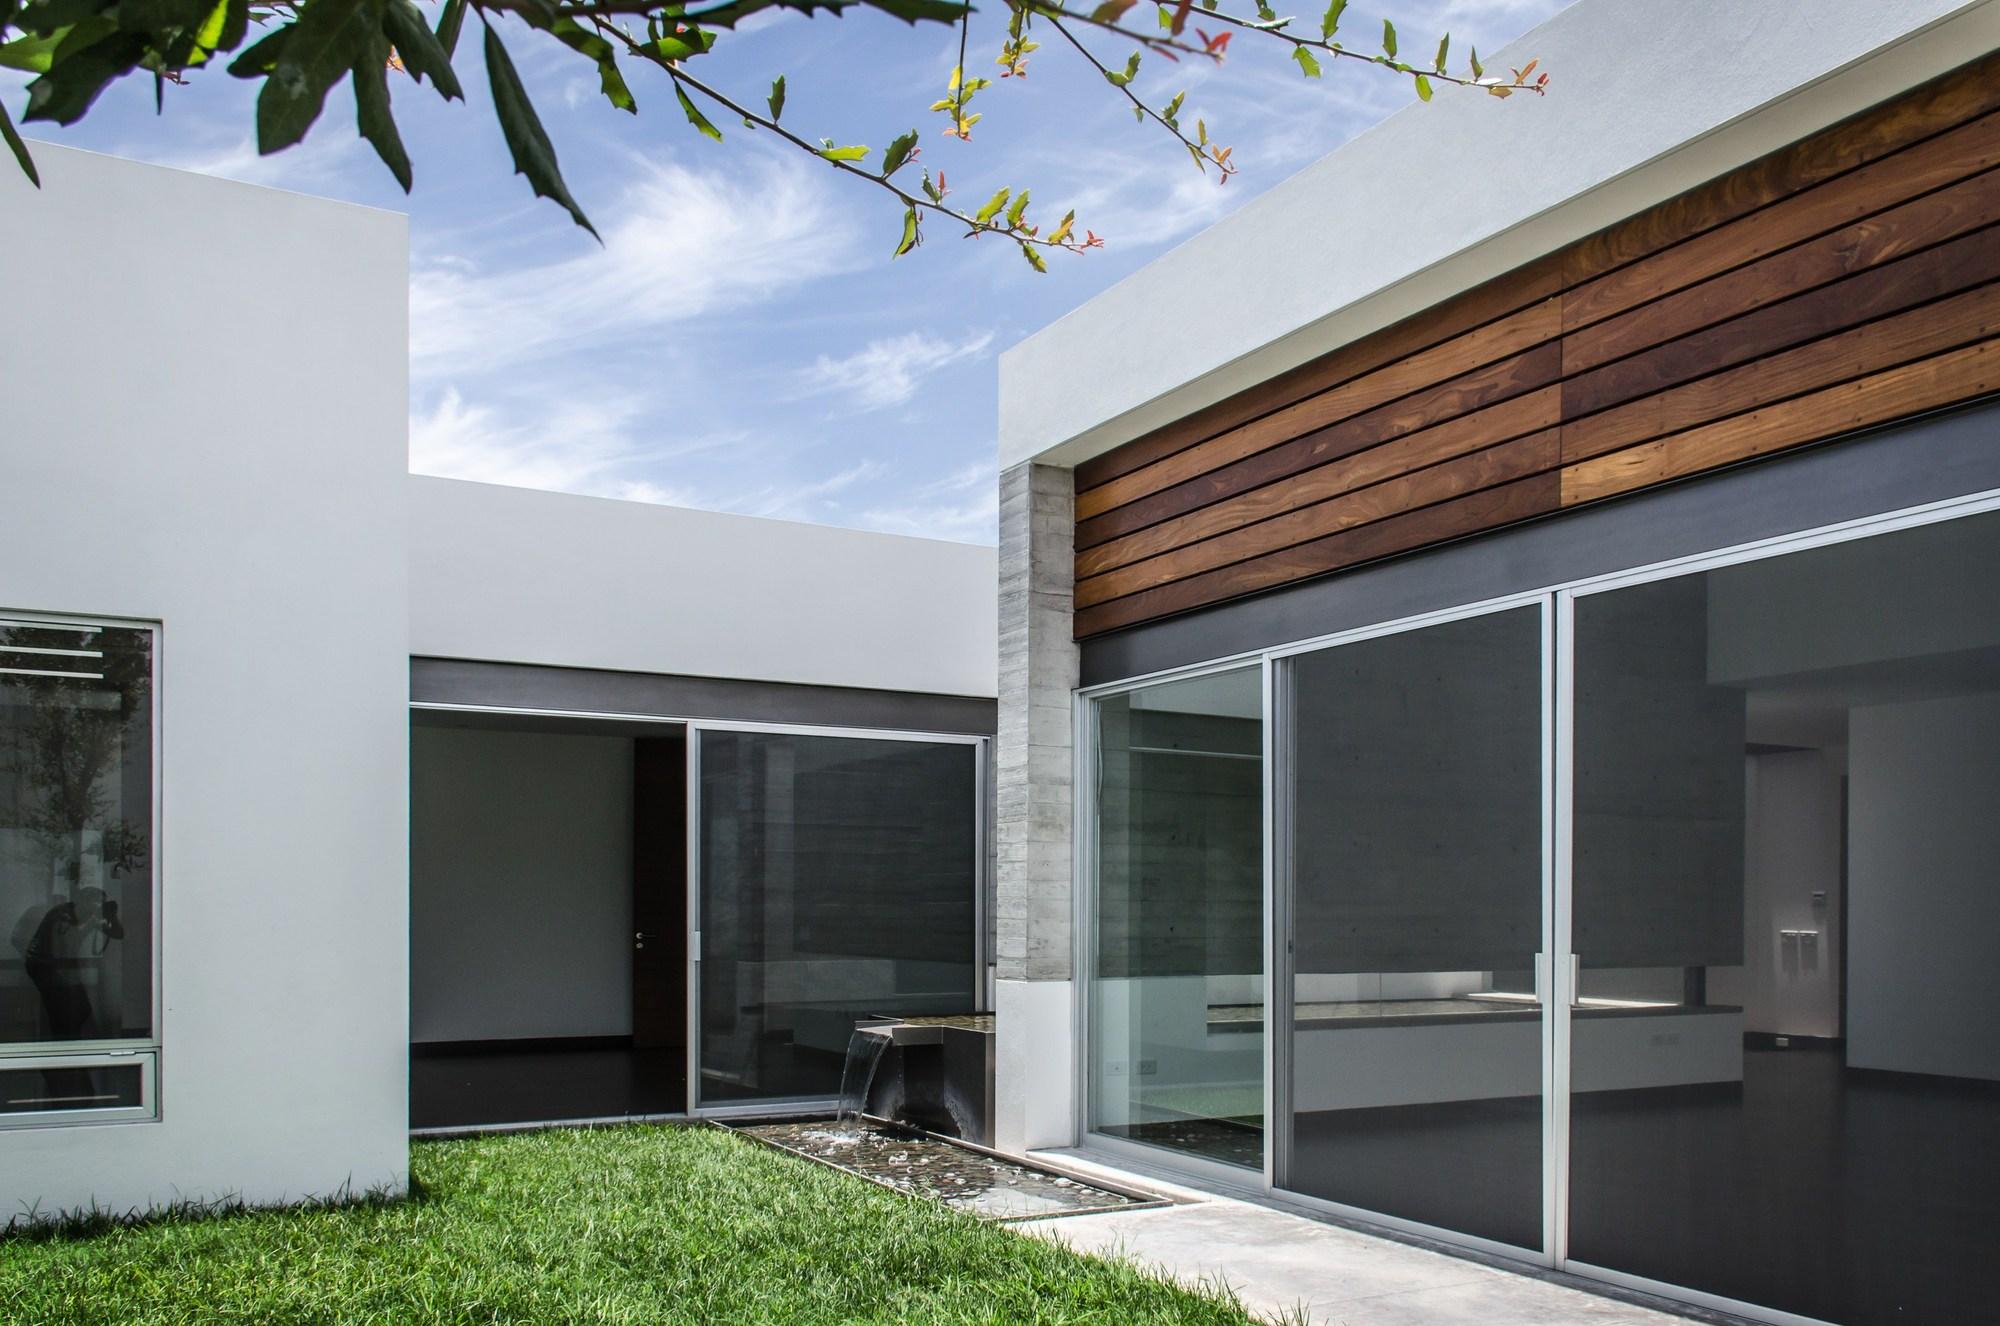 Gallery of t02 adi arquitectura y dise o interior 13 - Diseno interior casas ...